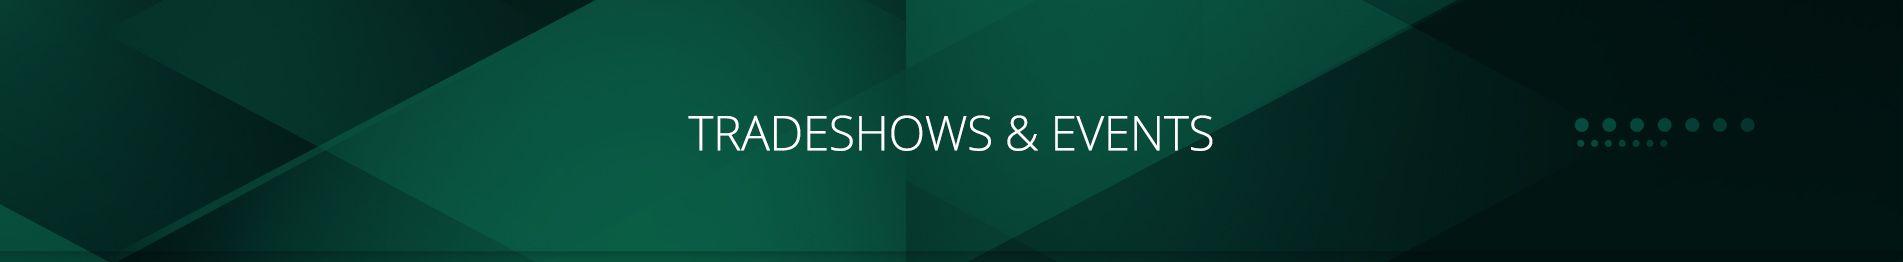 Envent Corporation | Tradeshows & Events